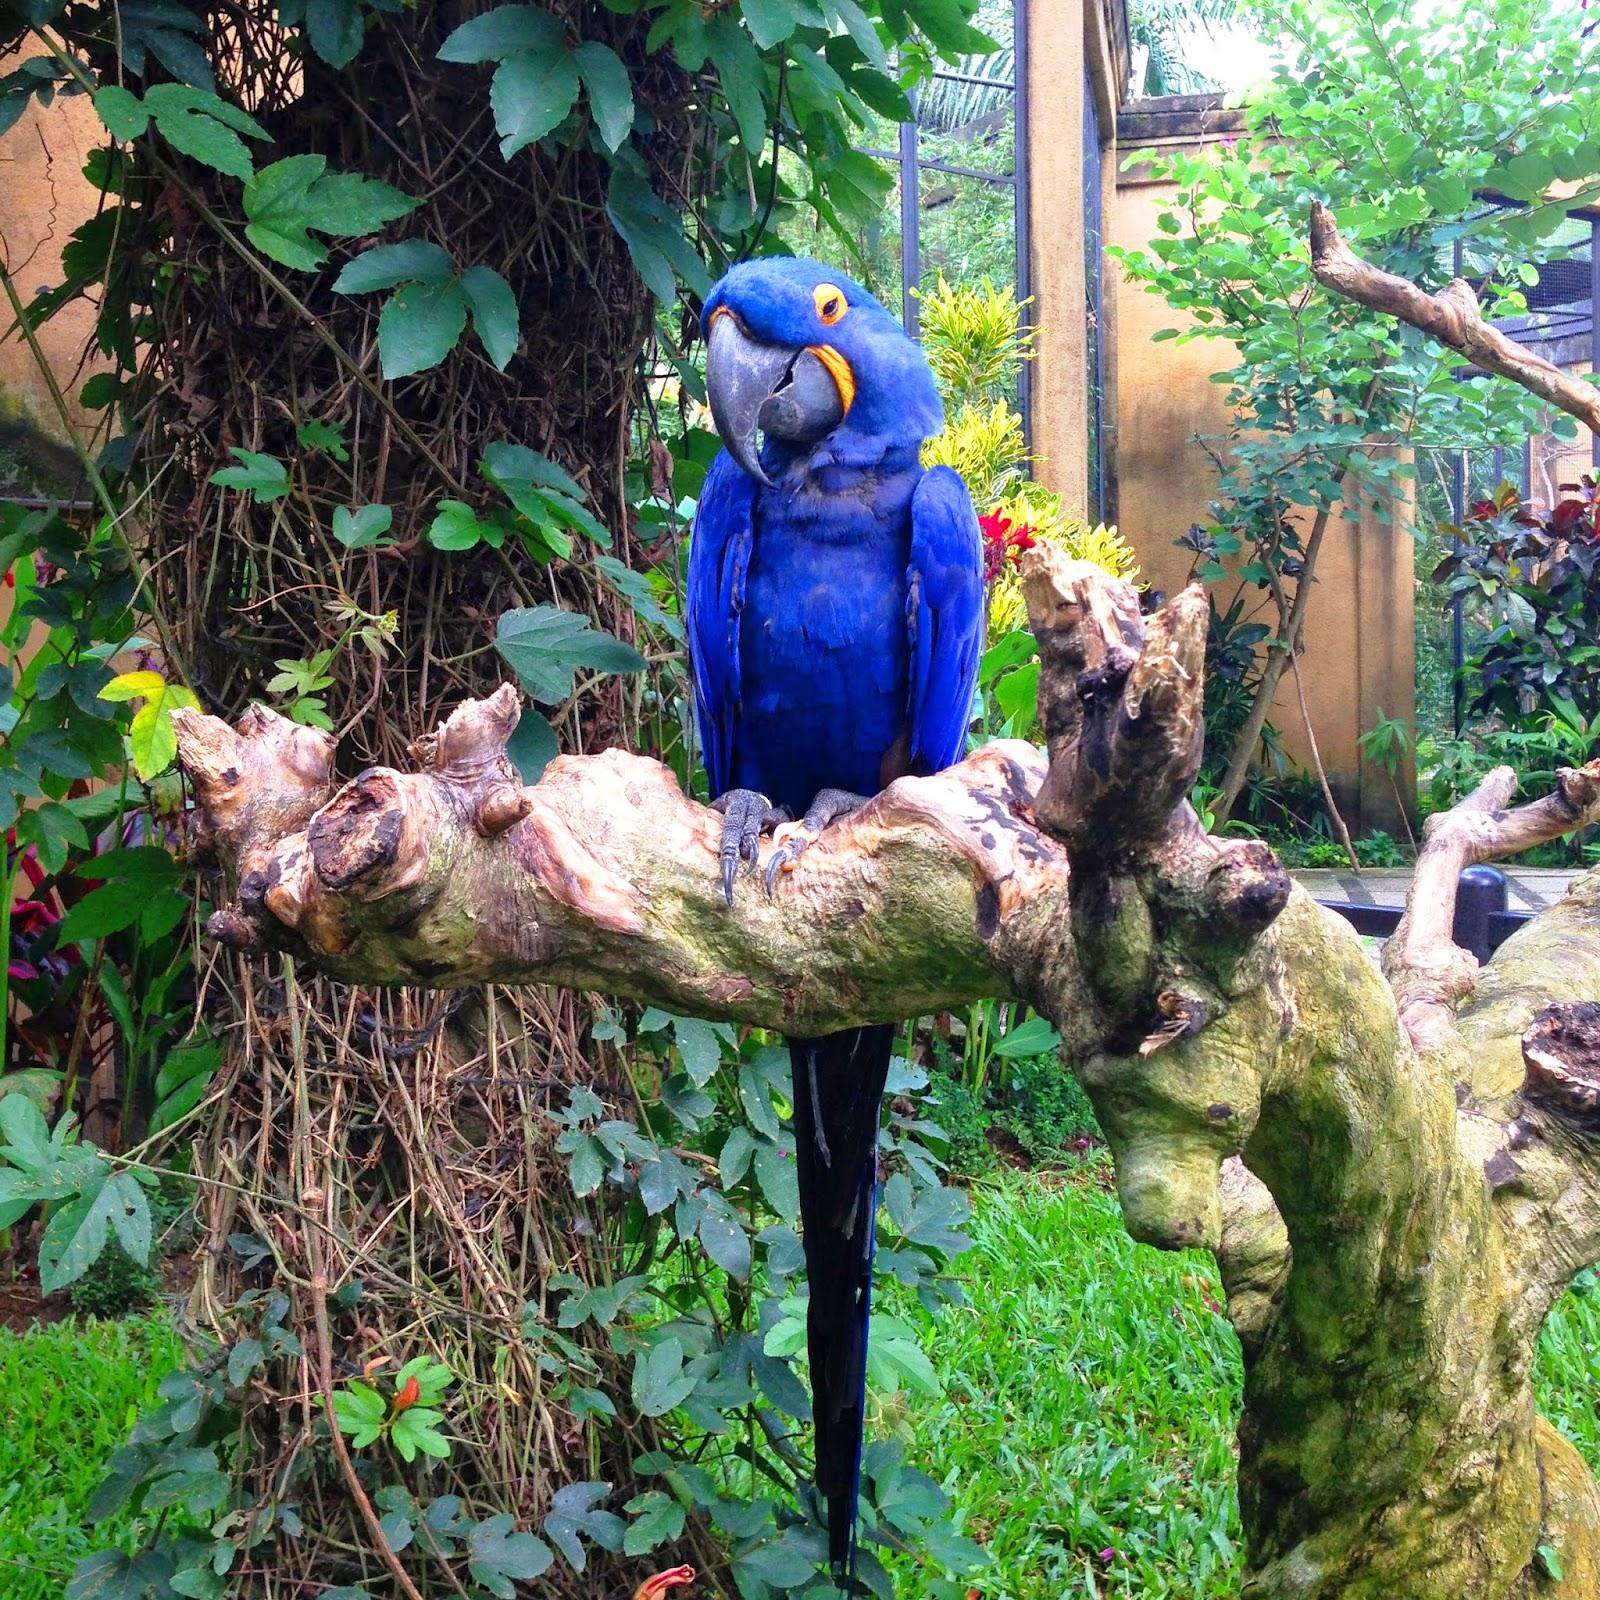 Promo Harga Voucher Tiket Masuk Anak Wisata Bali Bird Park Terbaru Aa6 1710 Macbear Baju Piyama Happy Cat Size 6 Abu Muda Bantall Living My Dream At Is Divided Into